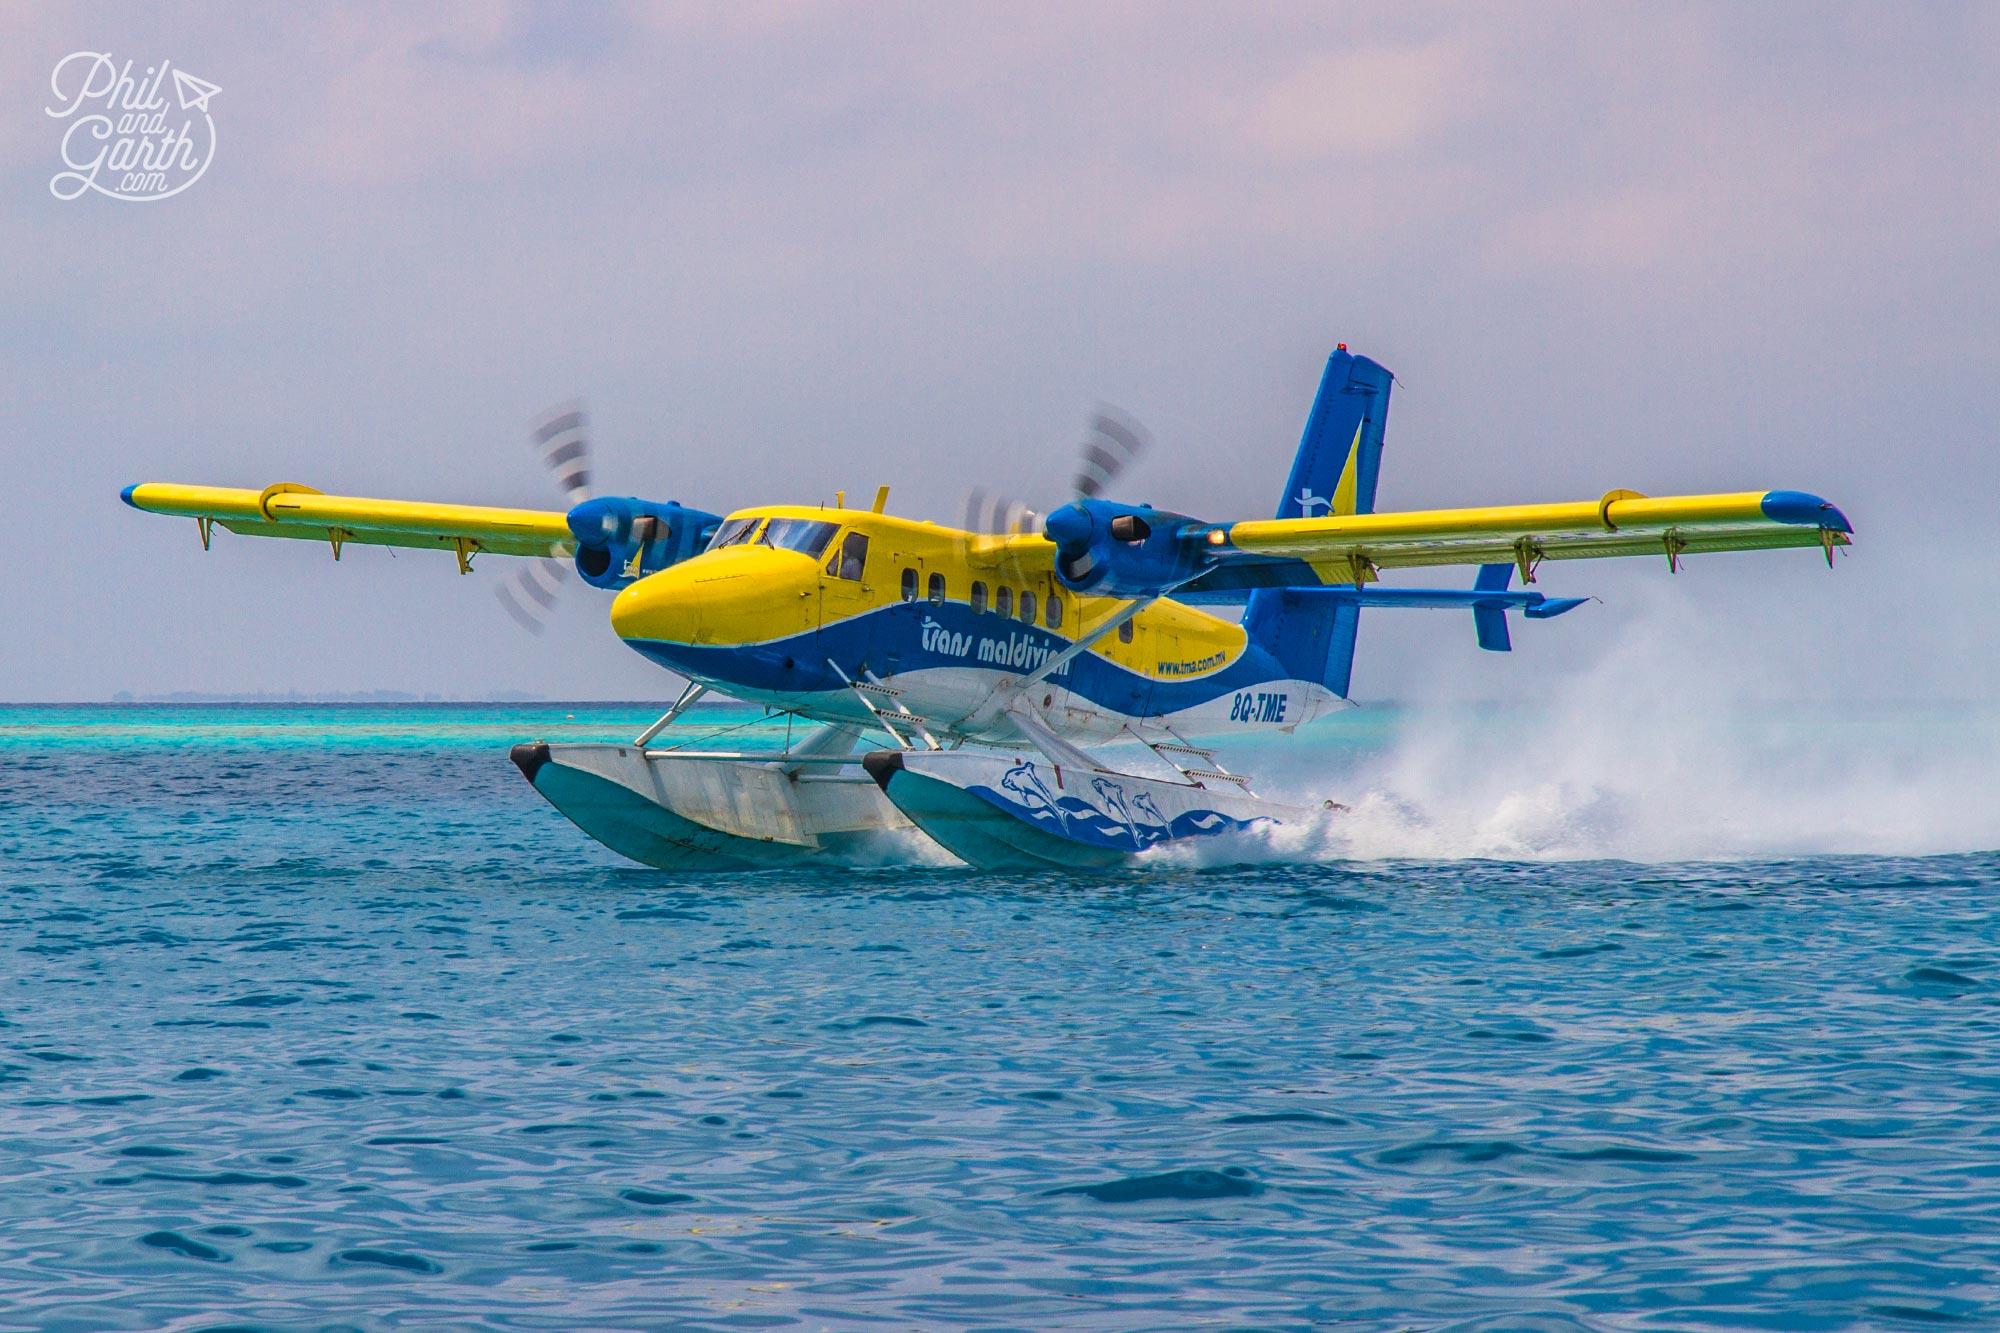 Seaplane sightseeing excursion